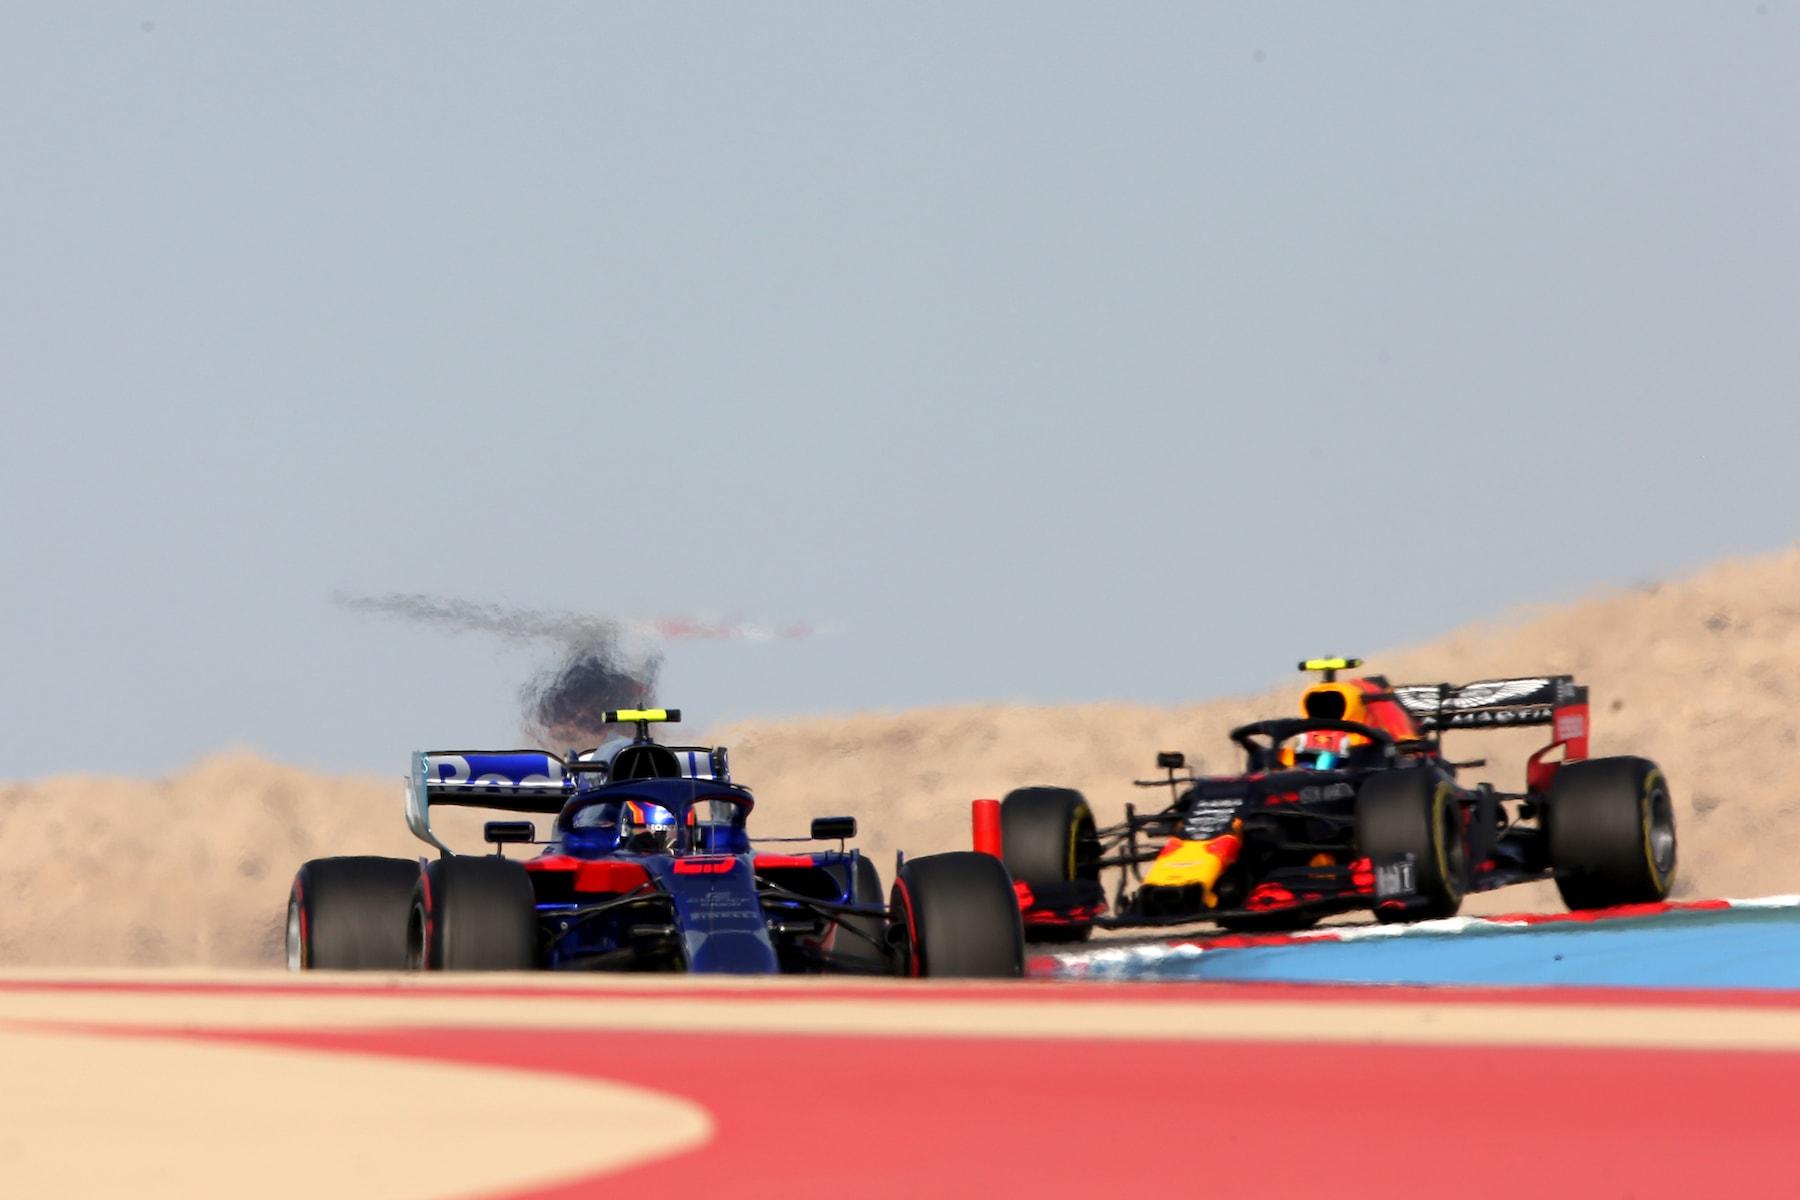 2 2 3 2019 Alex Albon | Toro Rosso STR14 | 2019 Bahrain GP FP3 1 copy.jpg